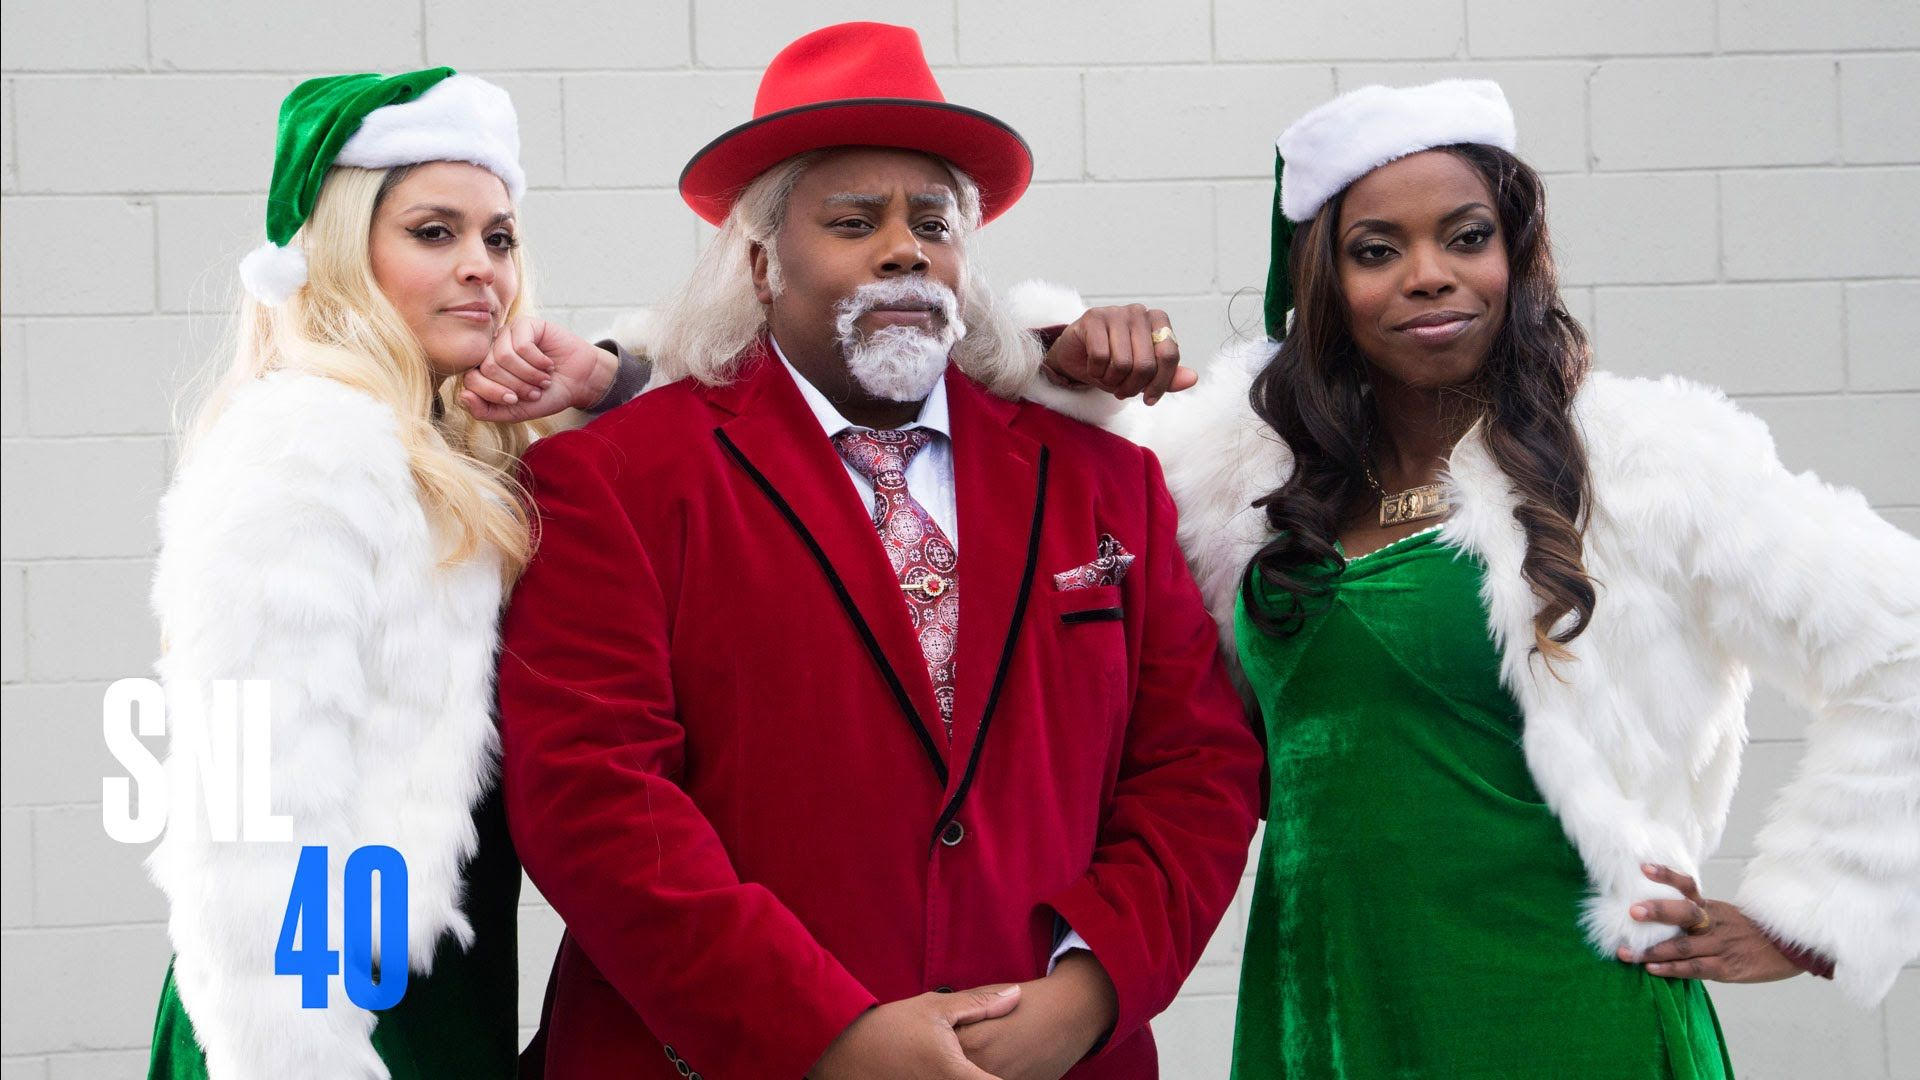 Sump\'n Claus - Saturday Night Live | crafting | Pinterest